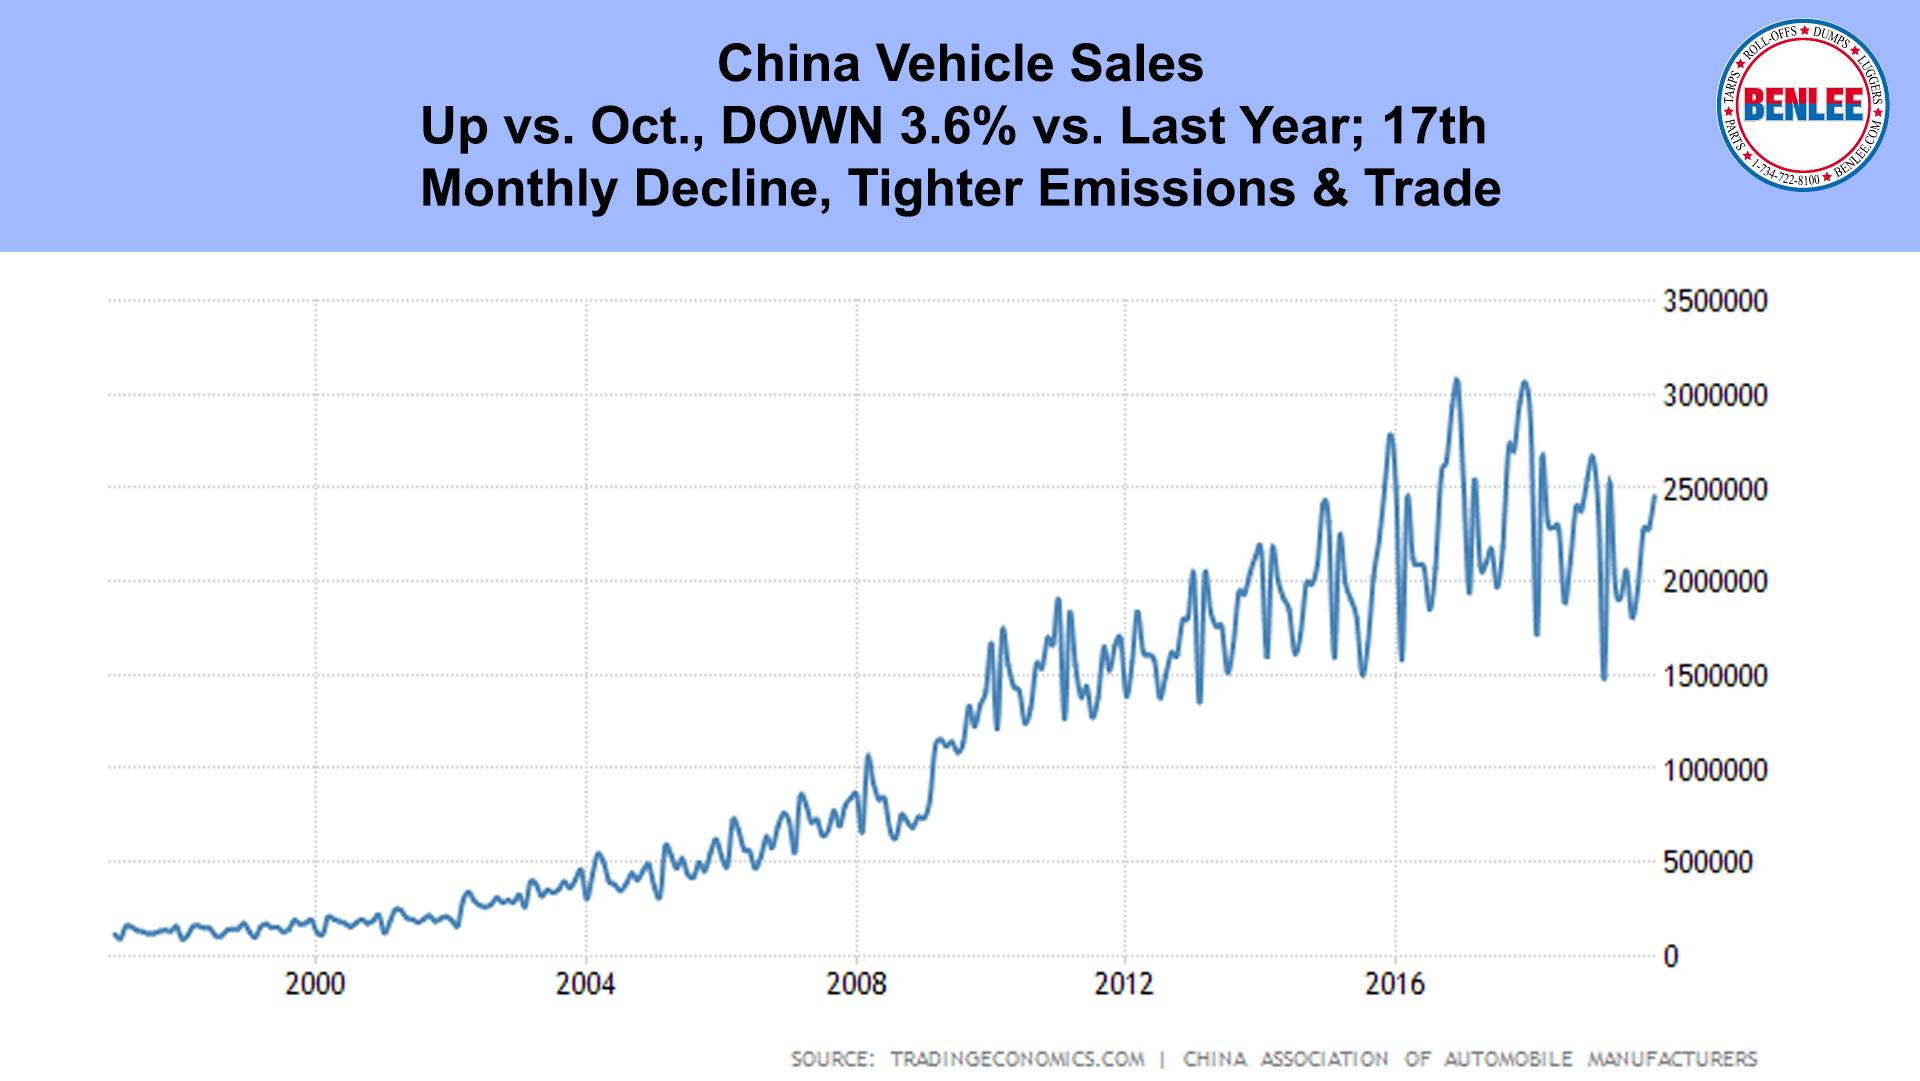 China Vehicle Sales